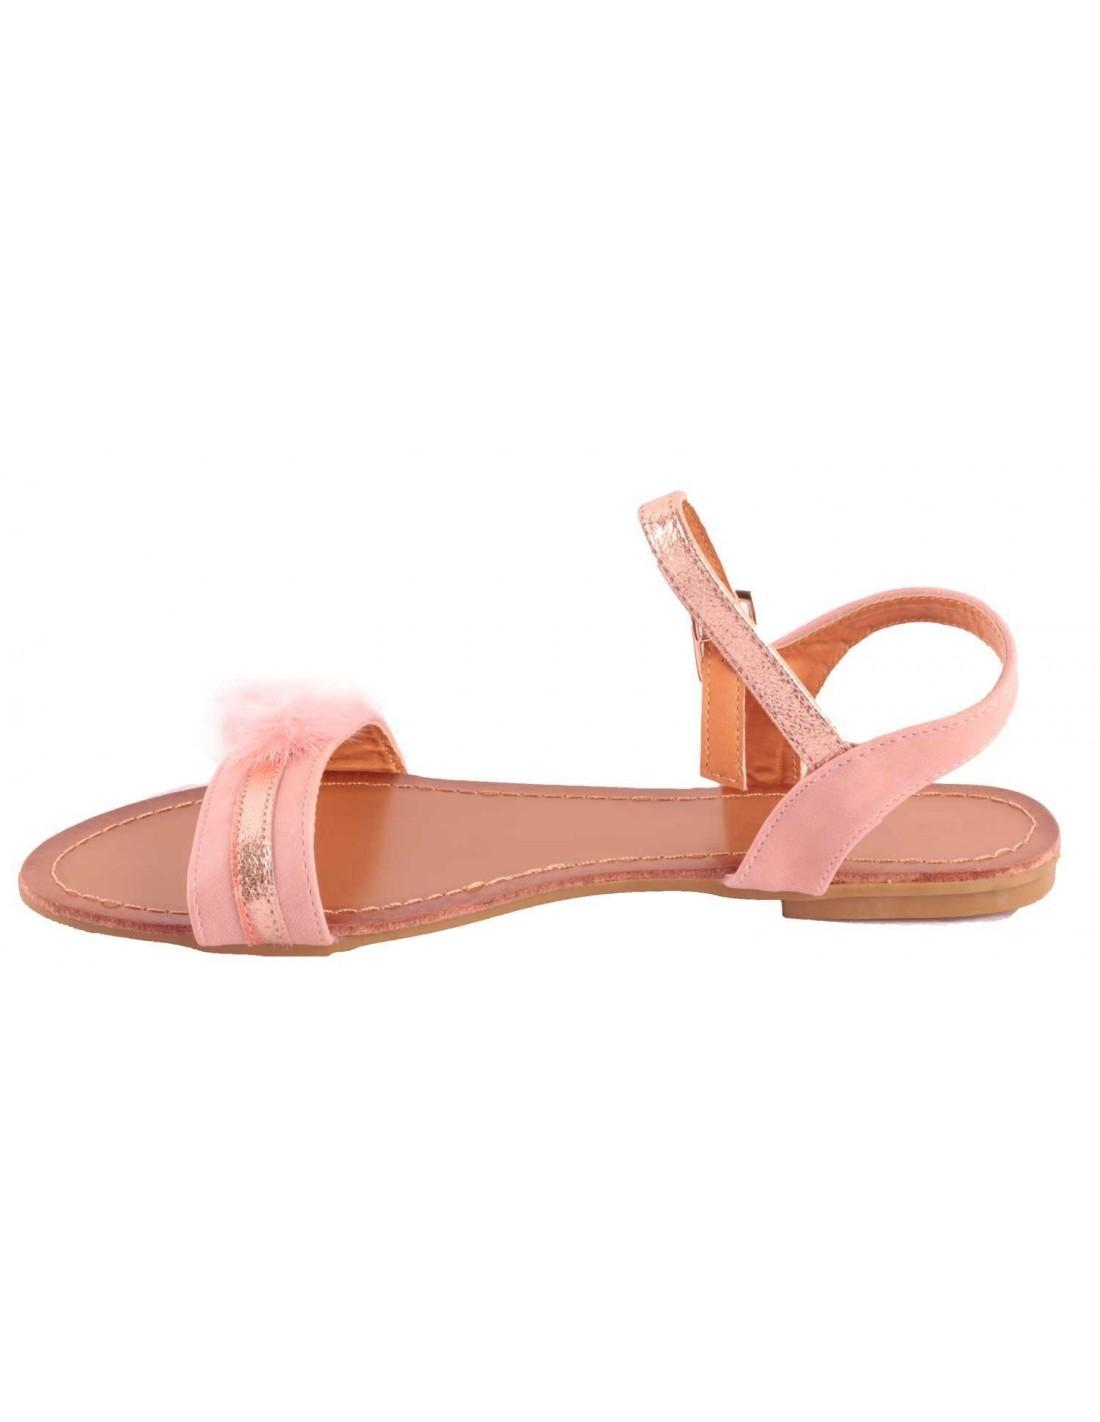 Sandales femme rose type nus pieds pompons fourrure synthétique & strass-41 kNU68